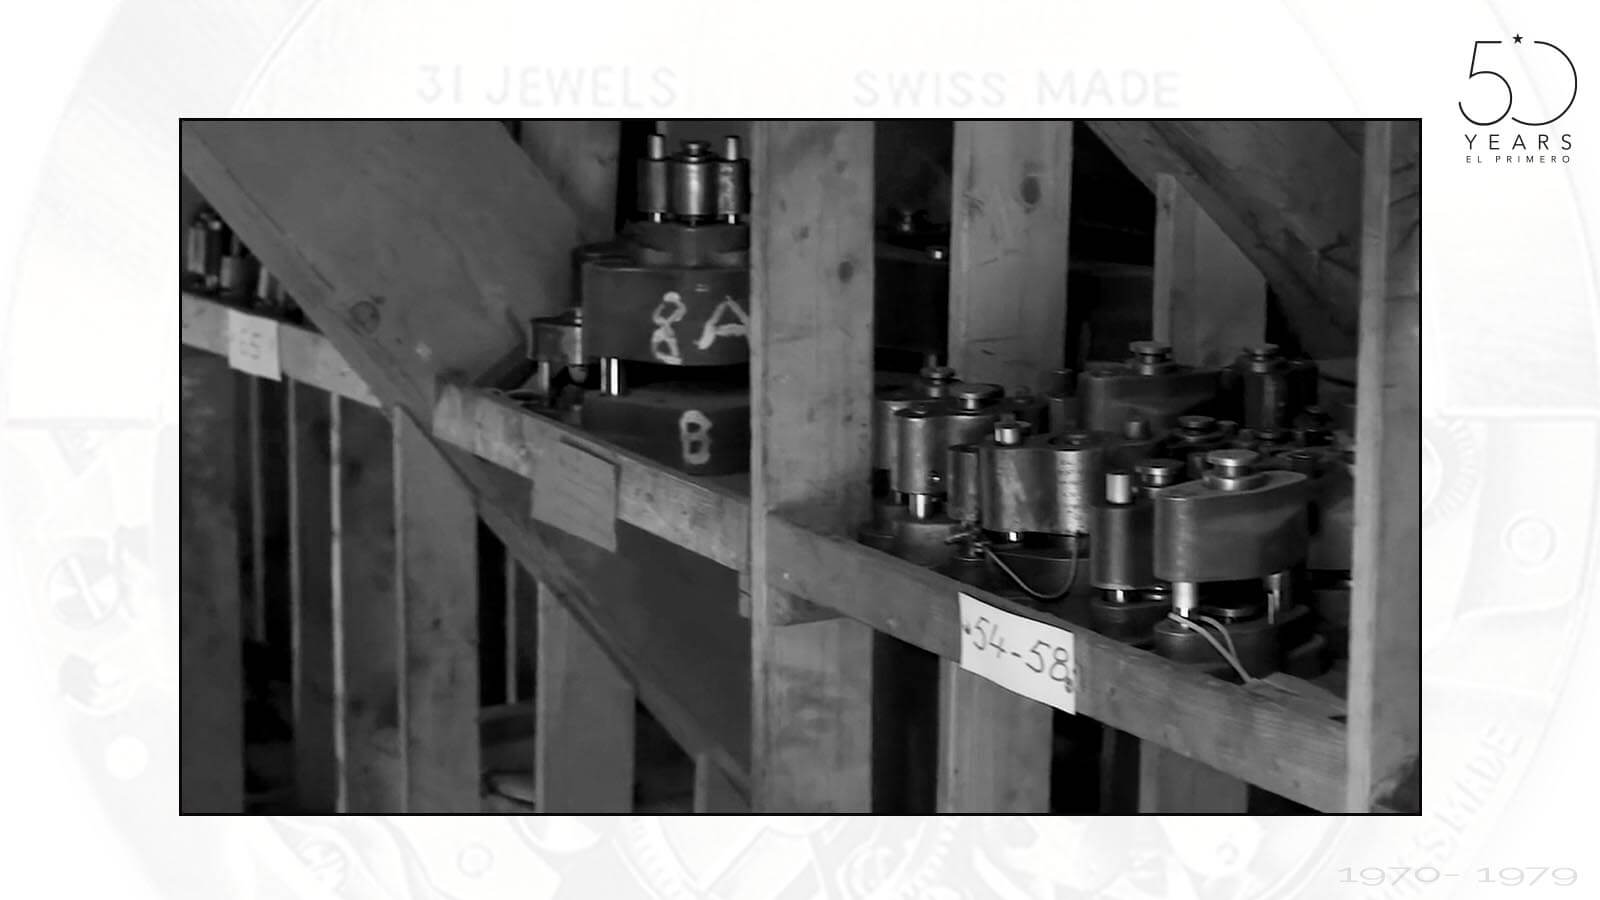 Werkzeuge zur Produktion des El Primero